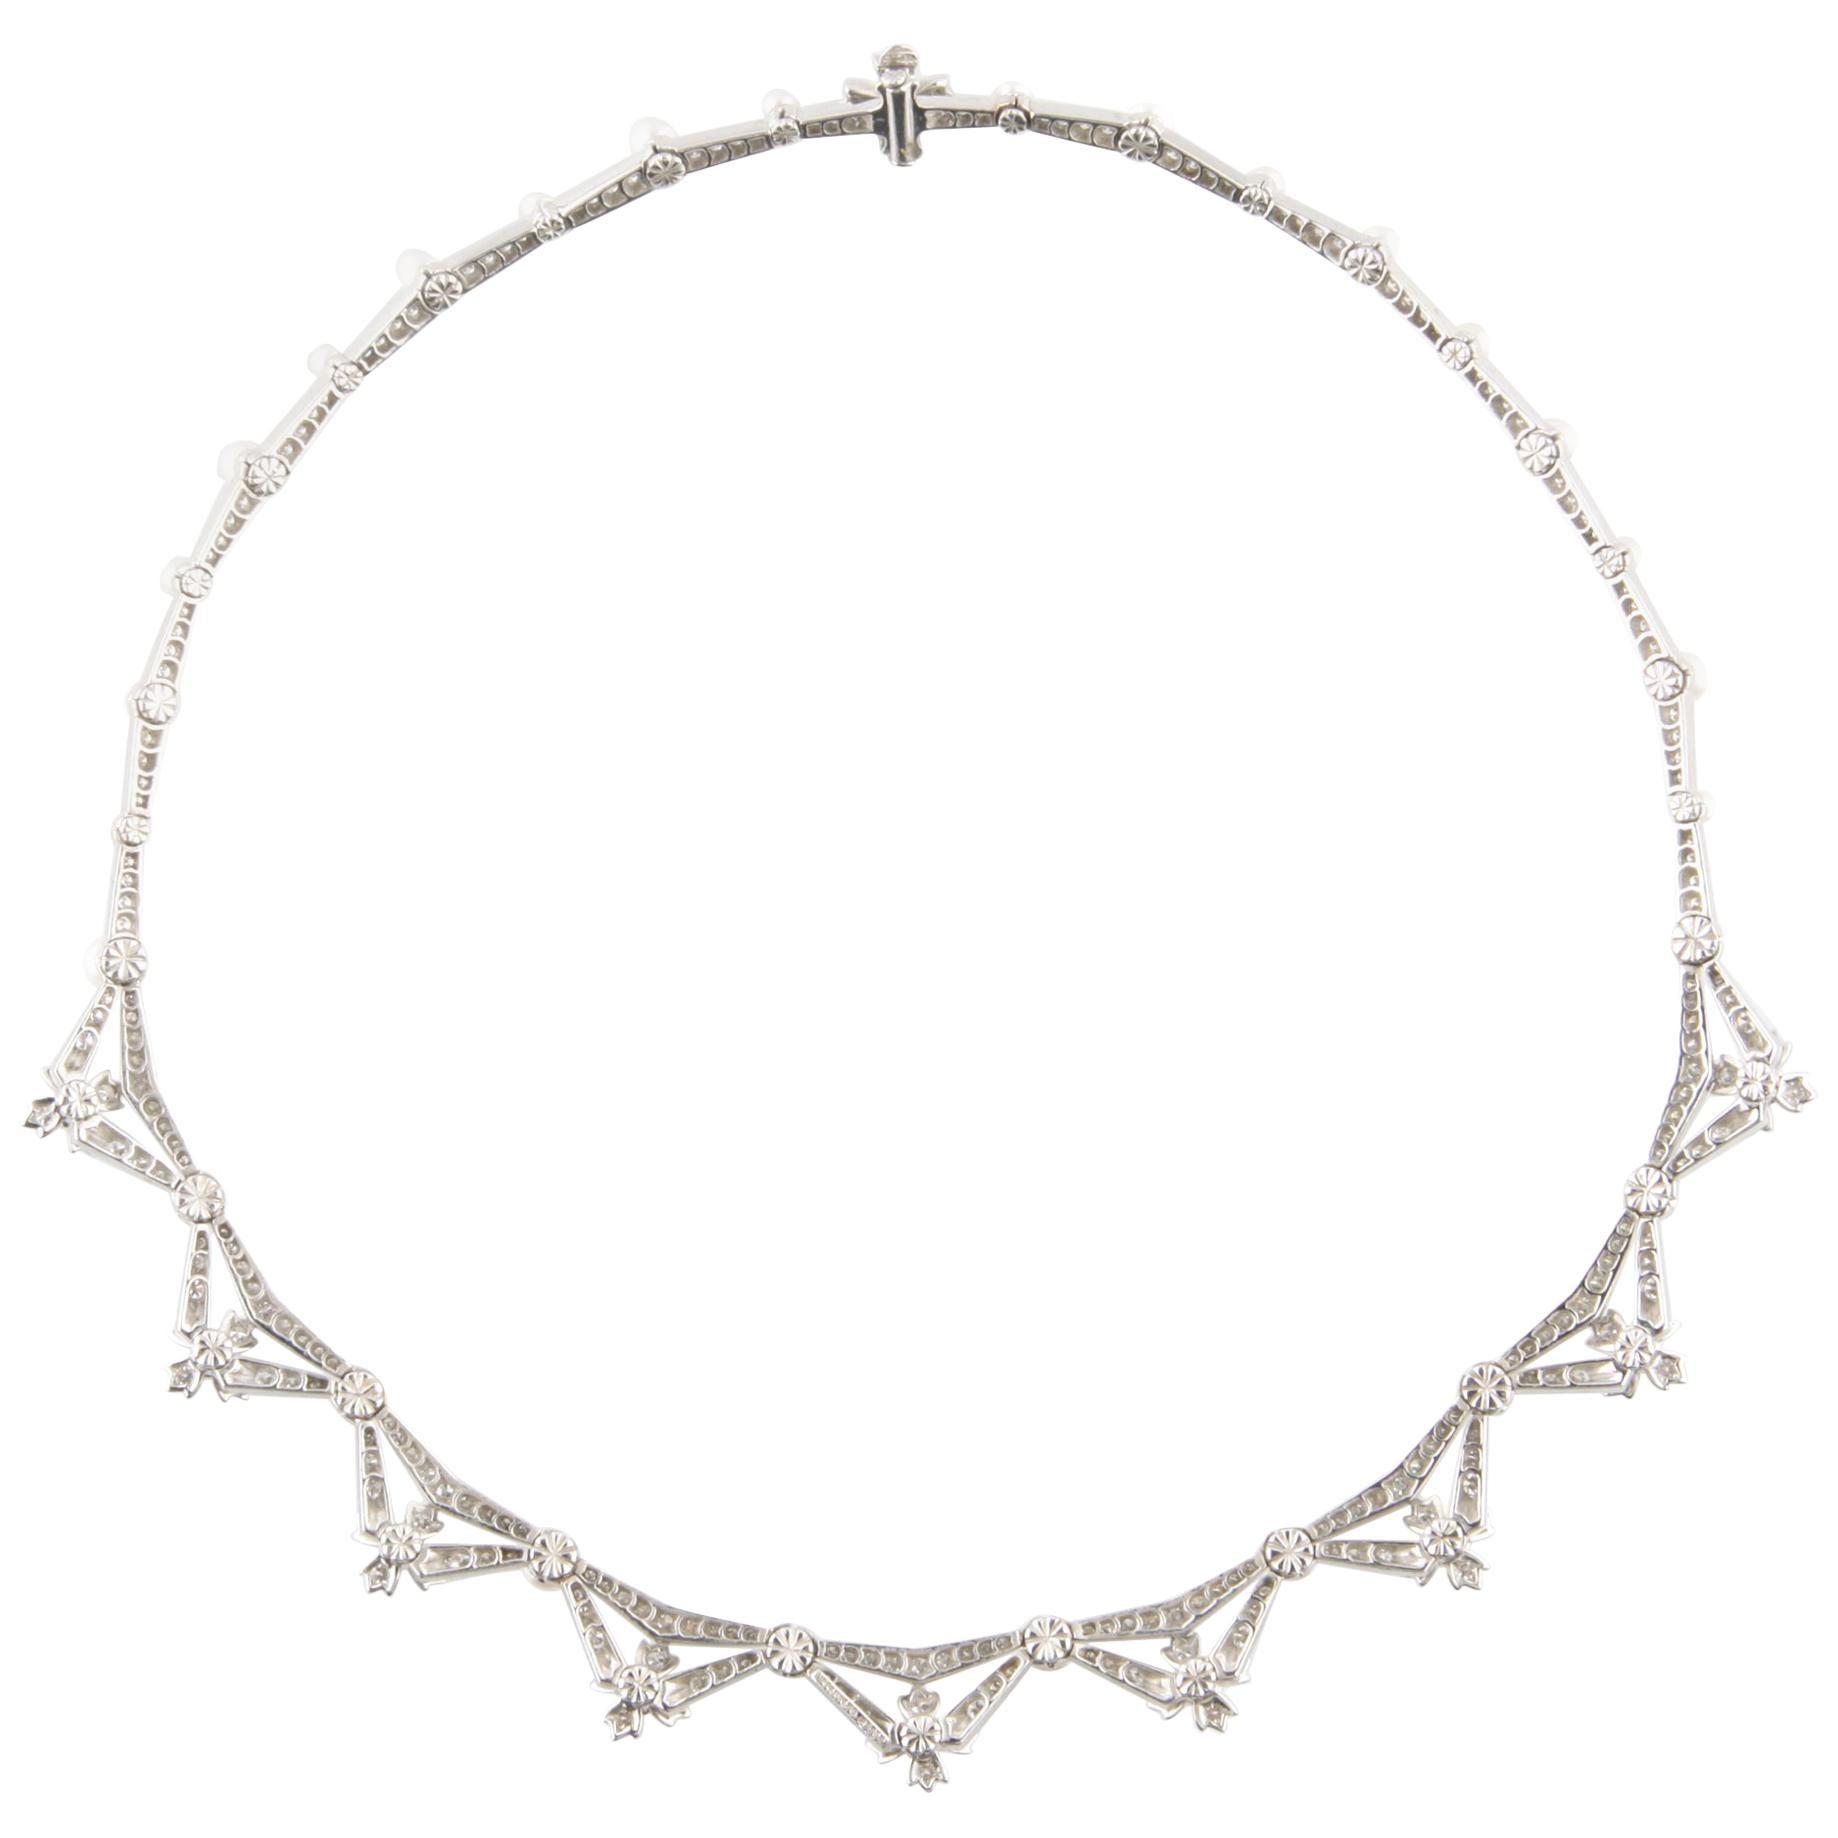 Tiffany & Co. 5.00 Carat Diamond and Pearl Platinum Necklace